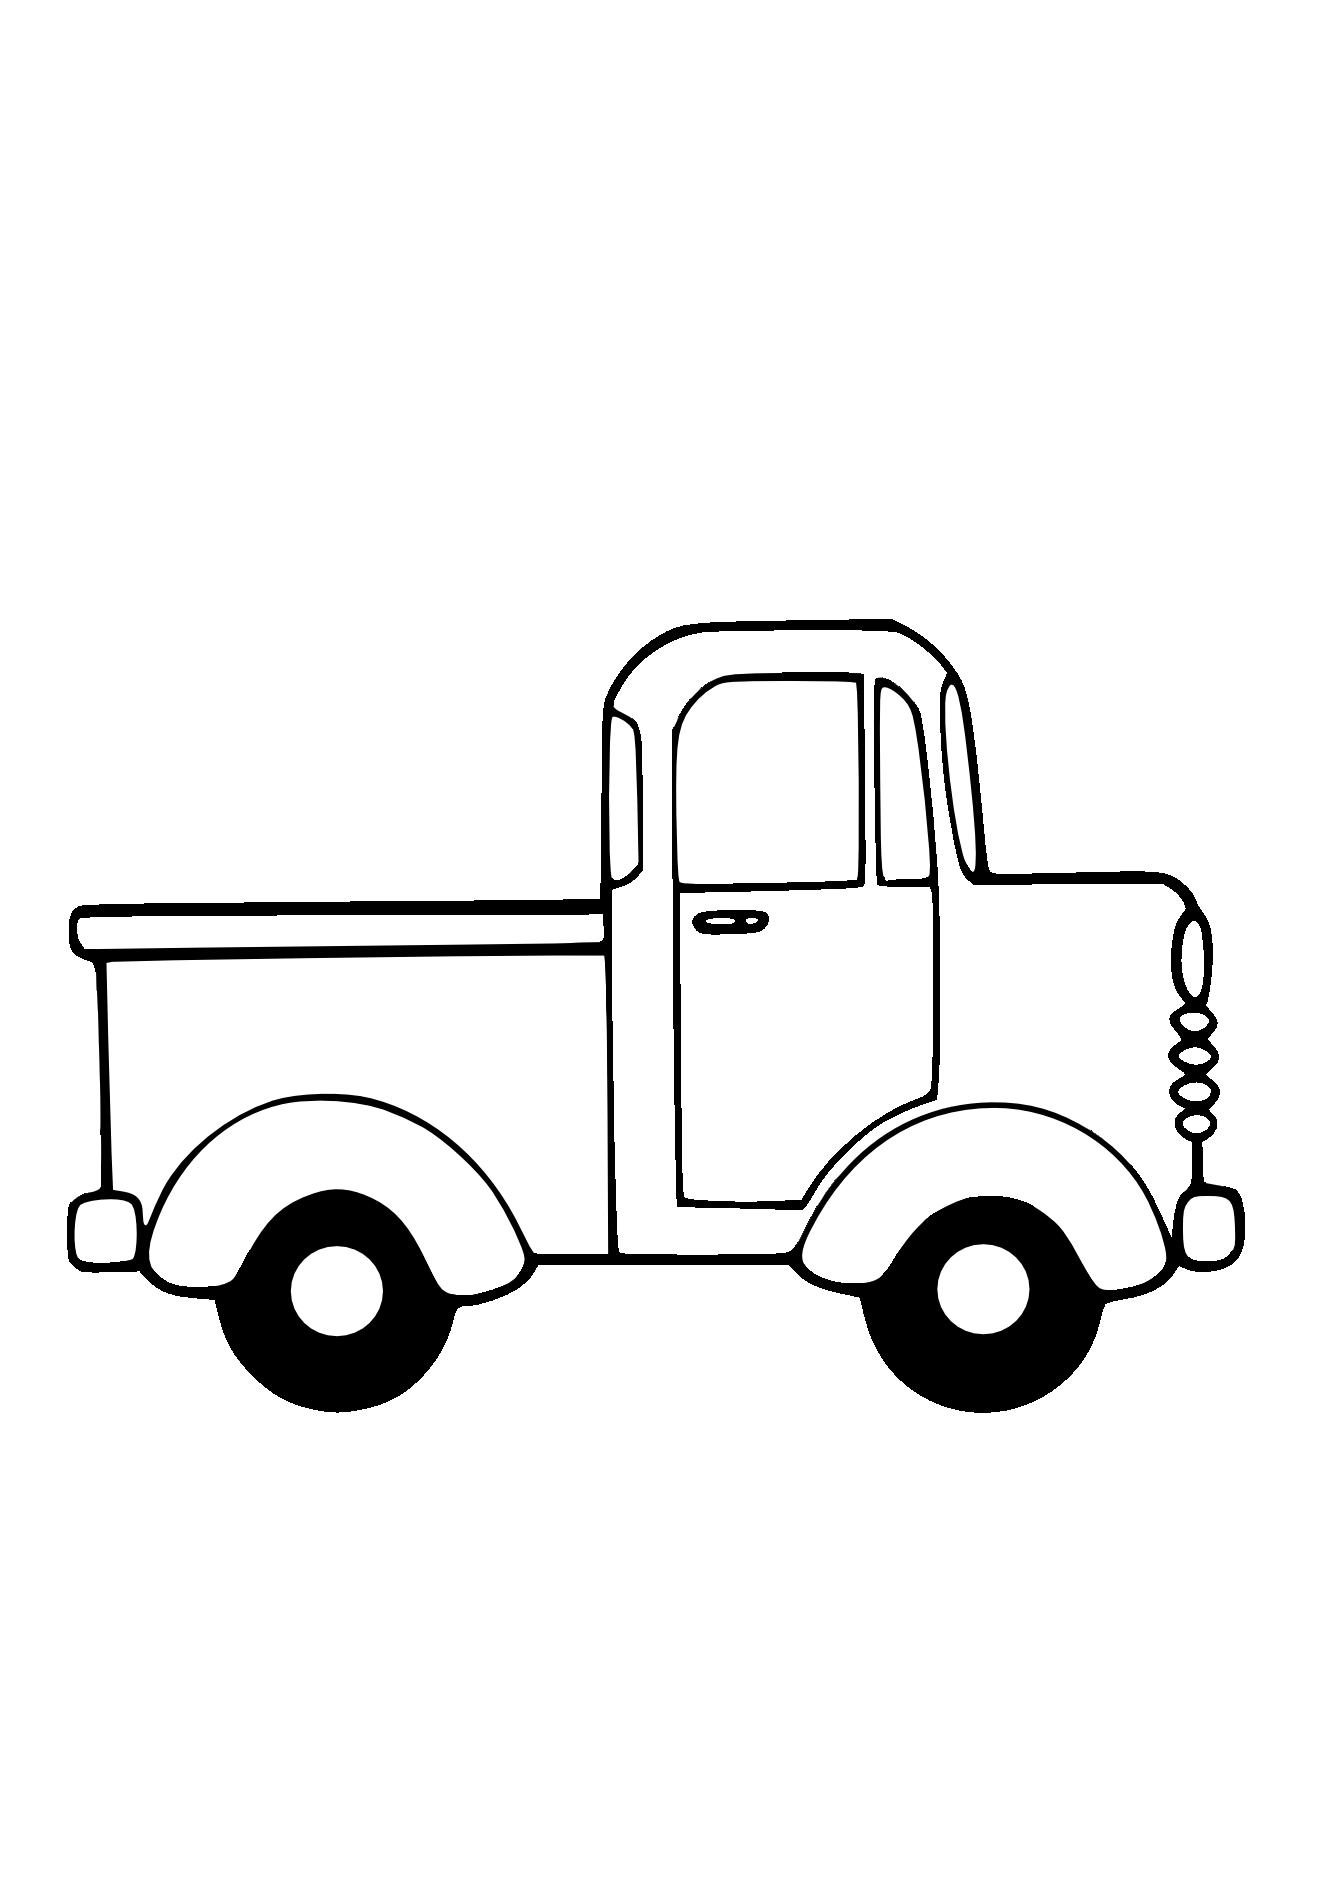 jpg transparent library Truck panda free images. Pickup clipart.